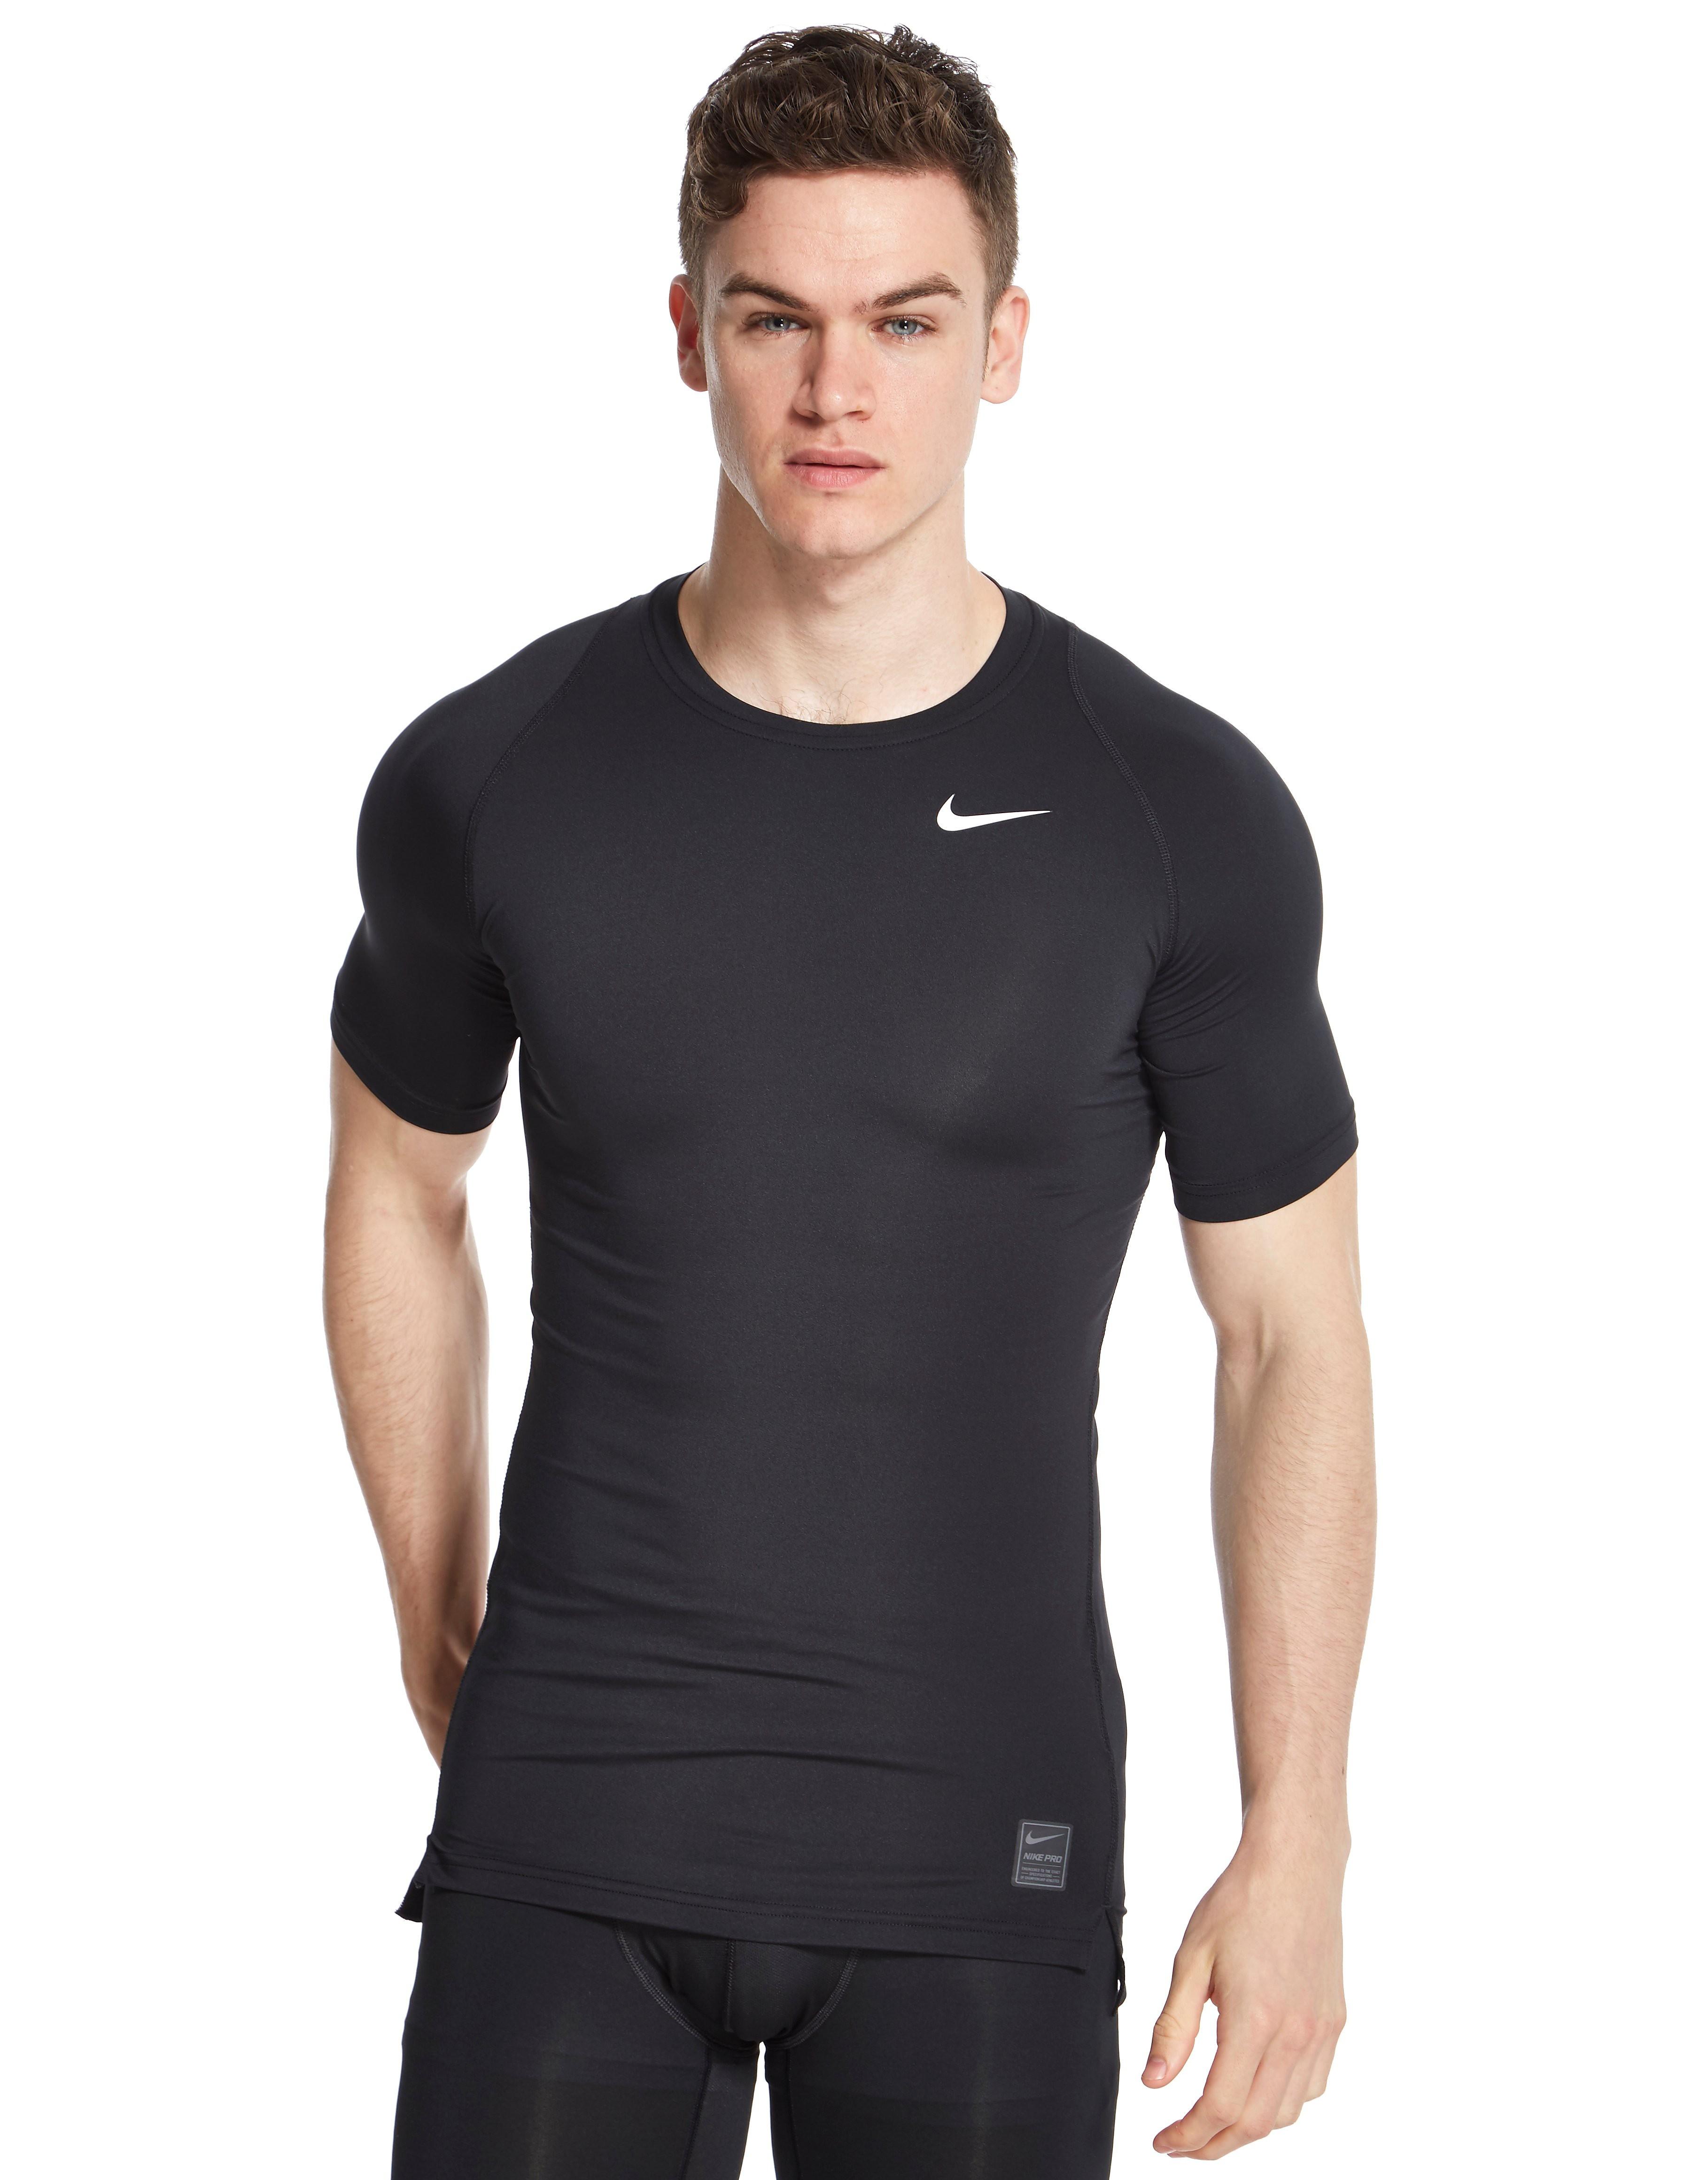 Nike Camiseta Pro Cool Compression